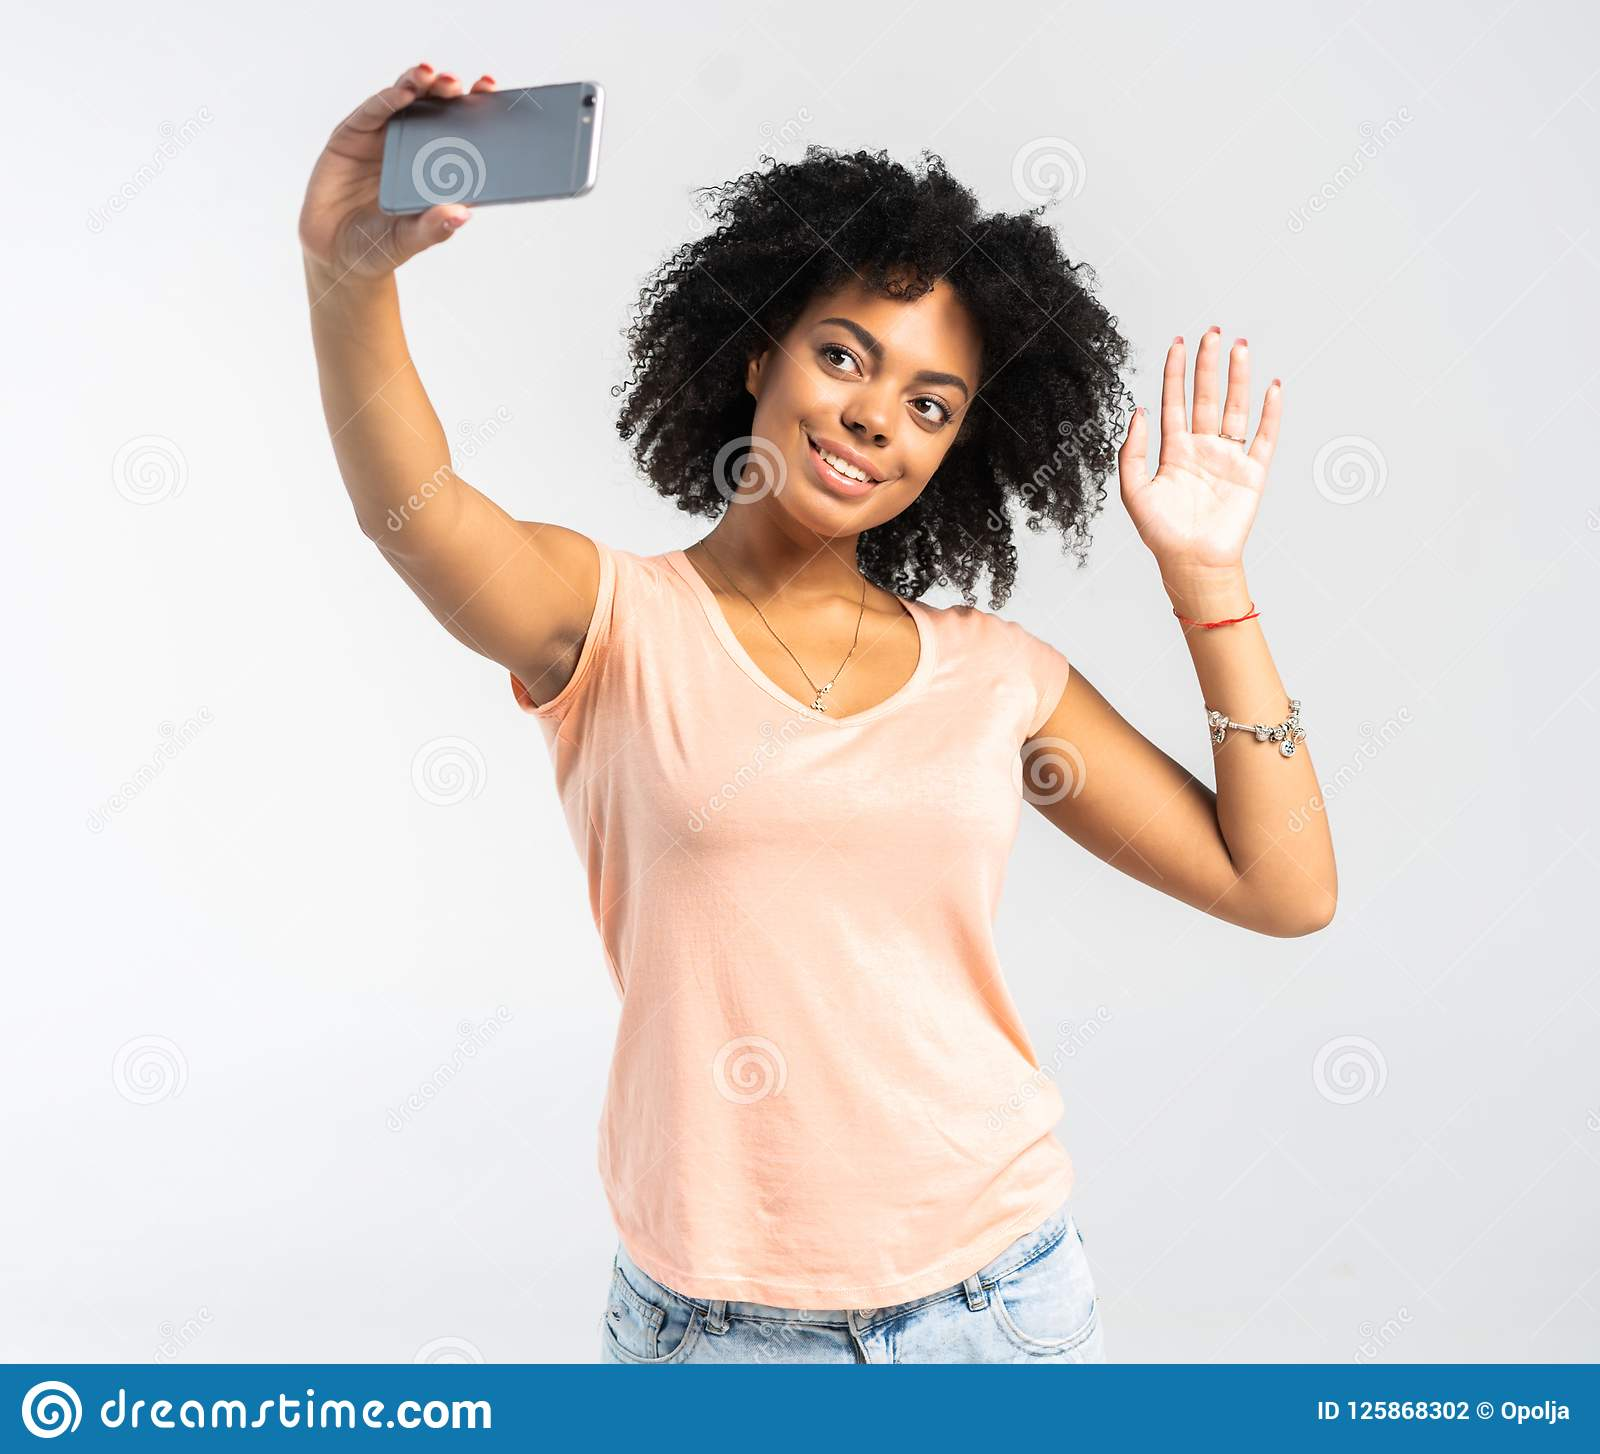 Final, sorry, young black teen girls selfies